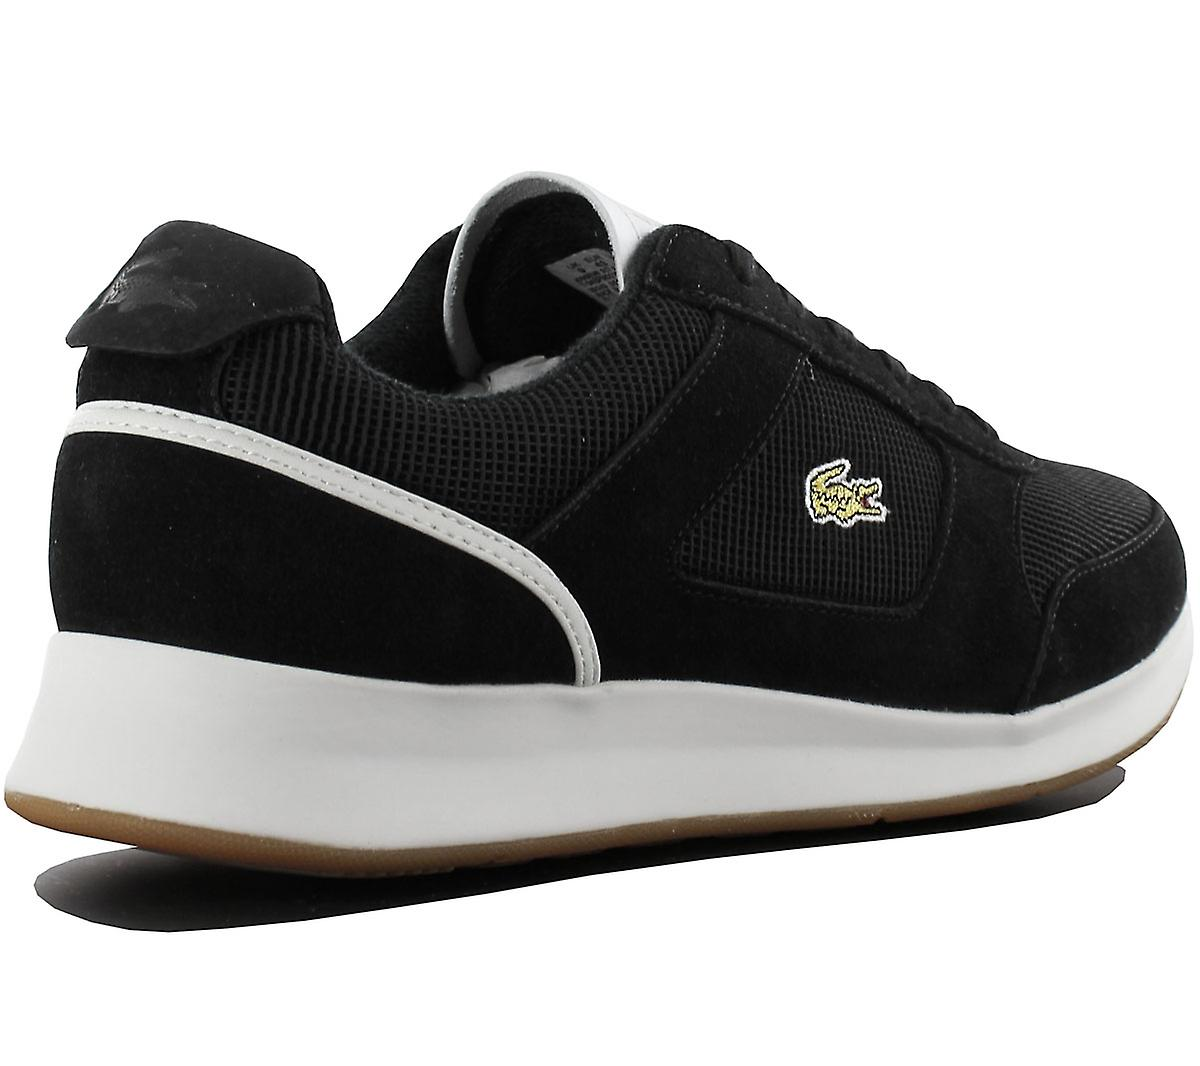 Lacoste Joggeur 7-34spm0016312 Herren Schuhe Schwarz Sneakers Sportschuhe